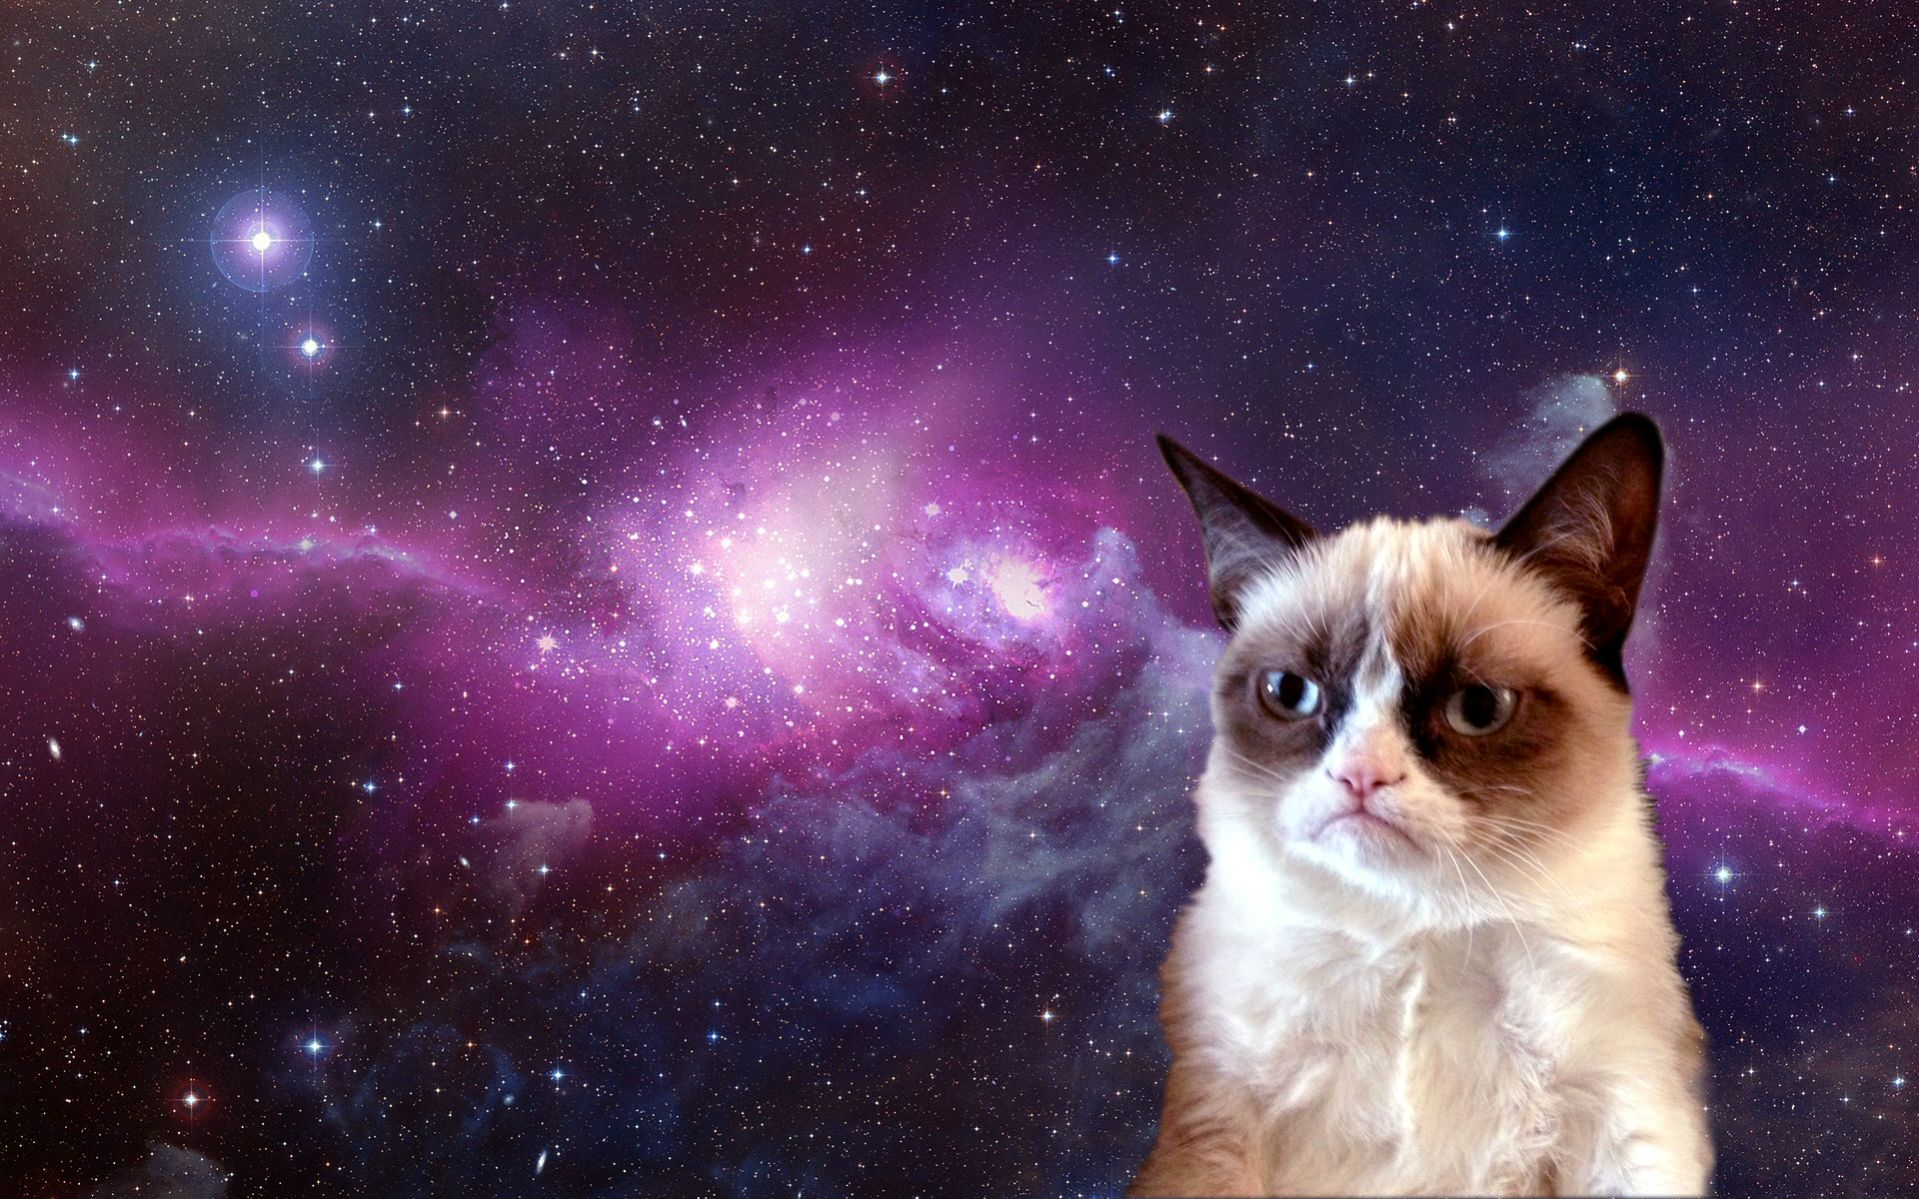 Grumpy Cat Meme HD Desktop Wallpaper HD Desktop Wallpaper 1919x1199